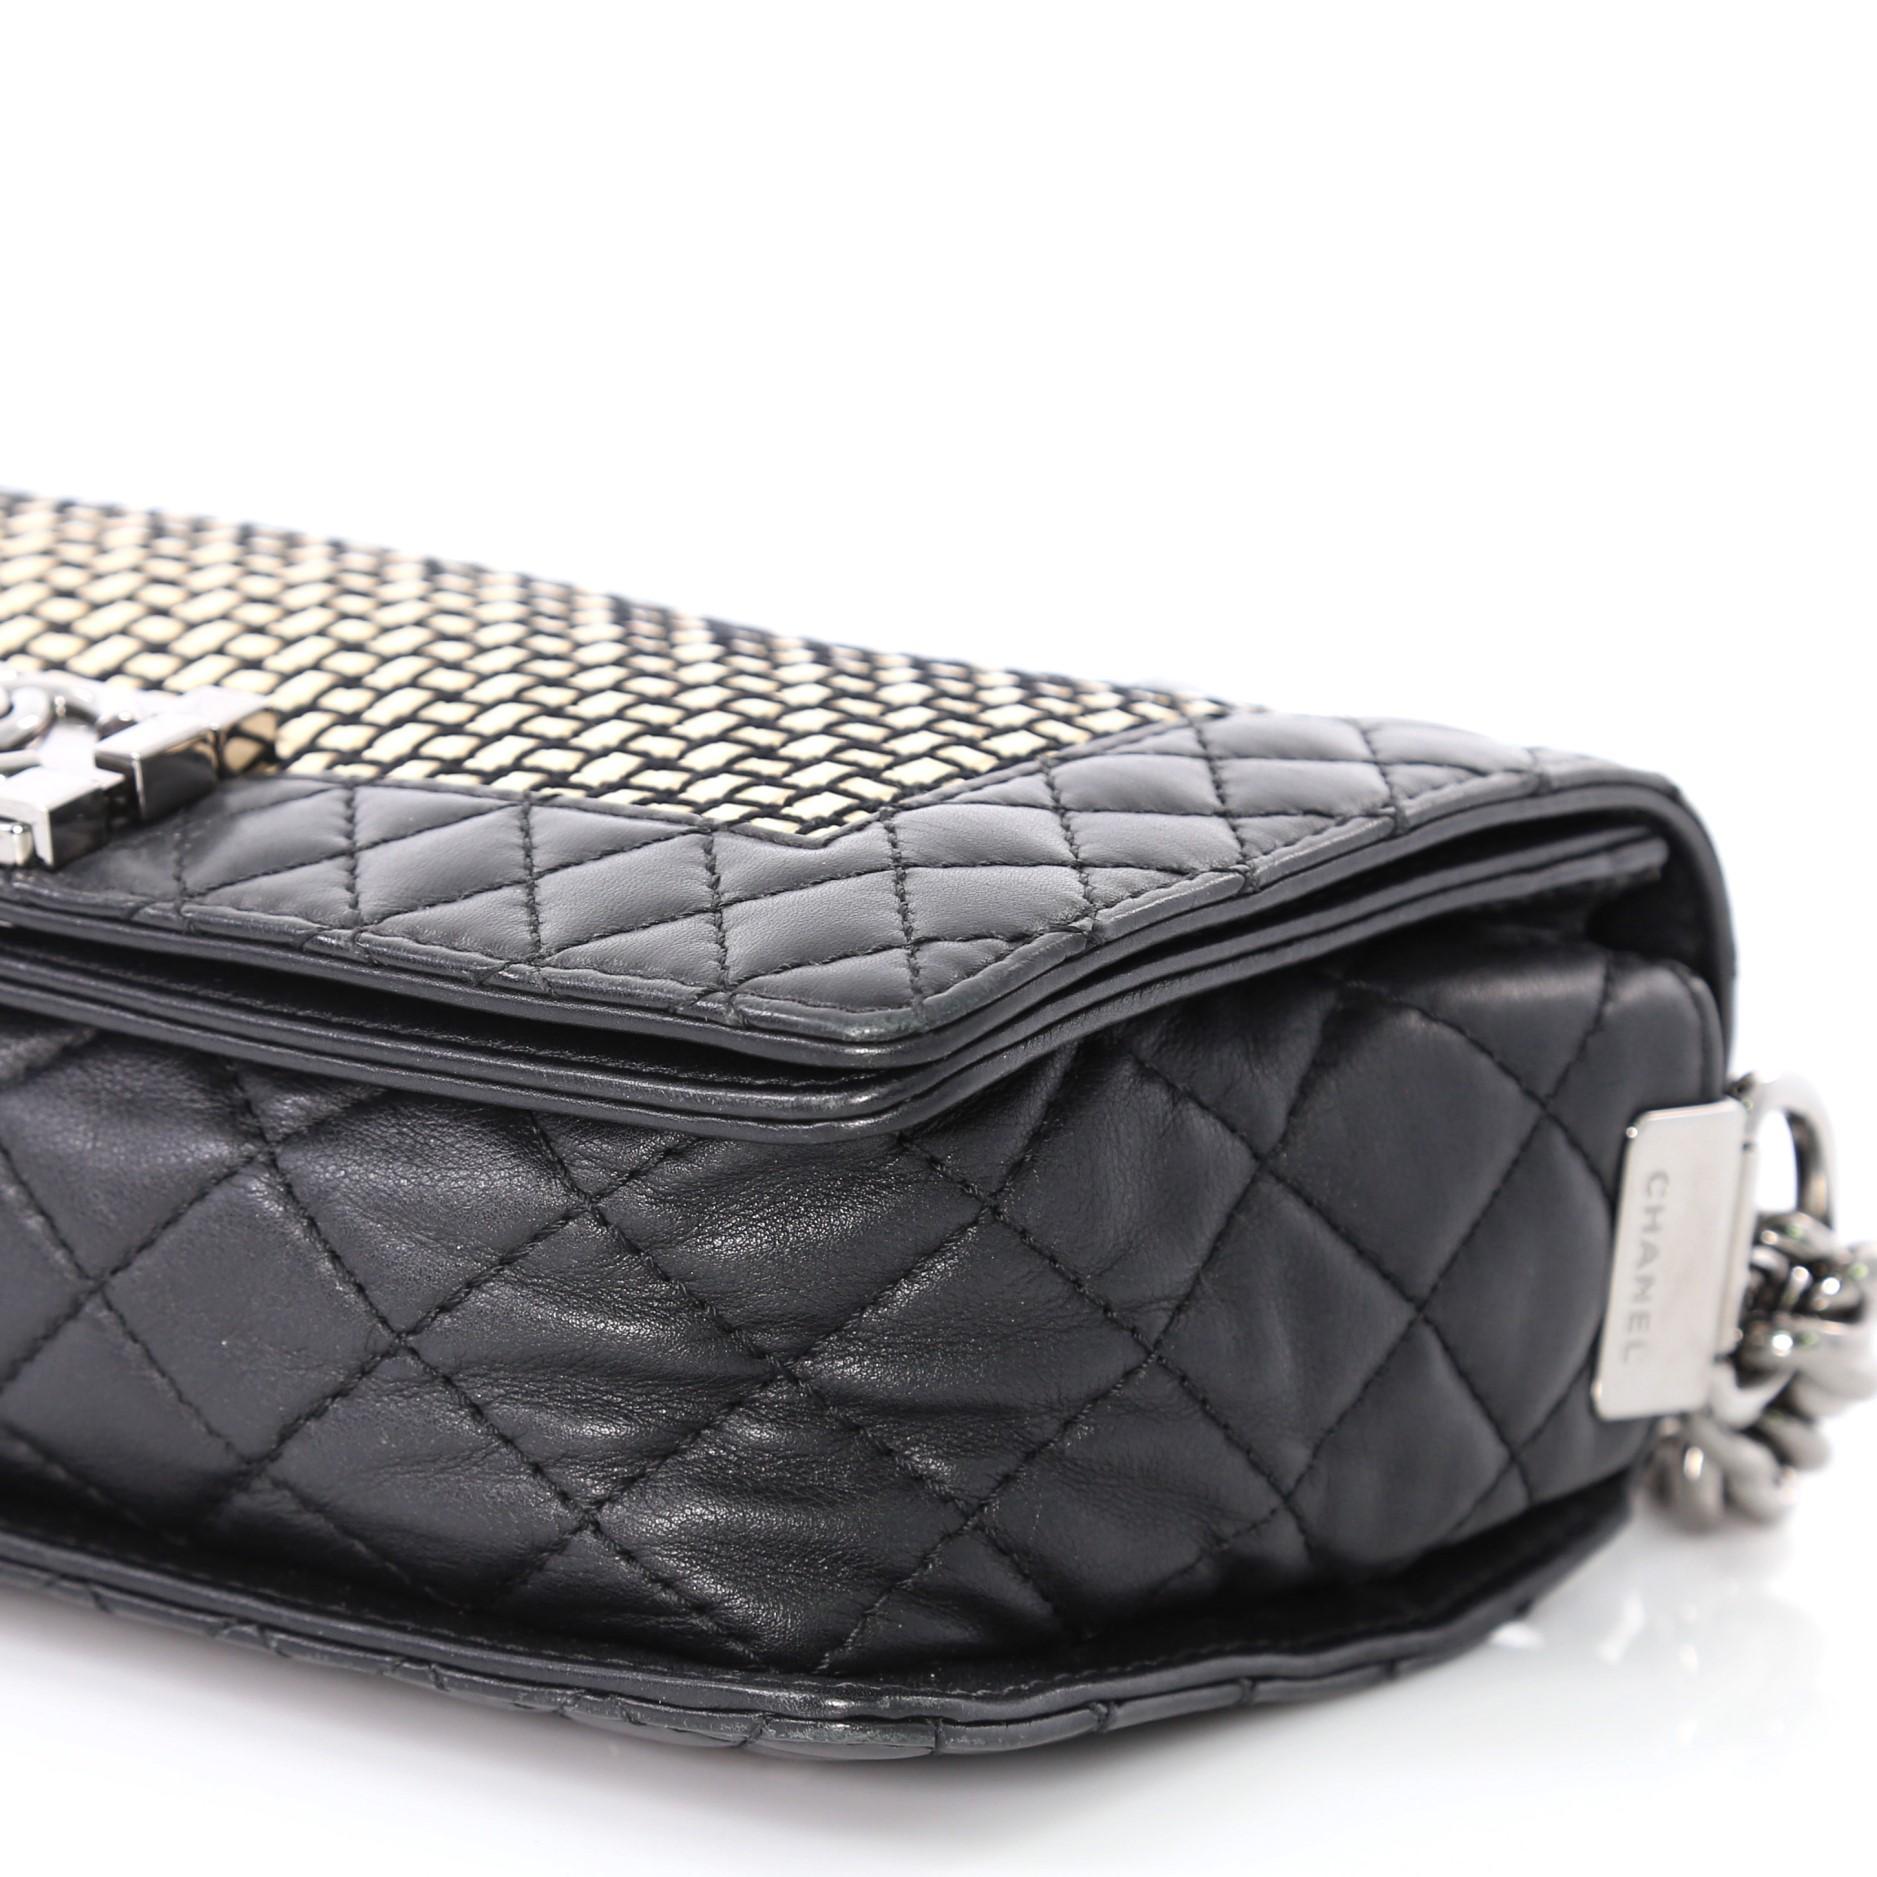 bbaa5f9de6e360 Chanel Reverso Boy Flap Bag Woven Calfskin Old Medium For Sale at 1stdibs